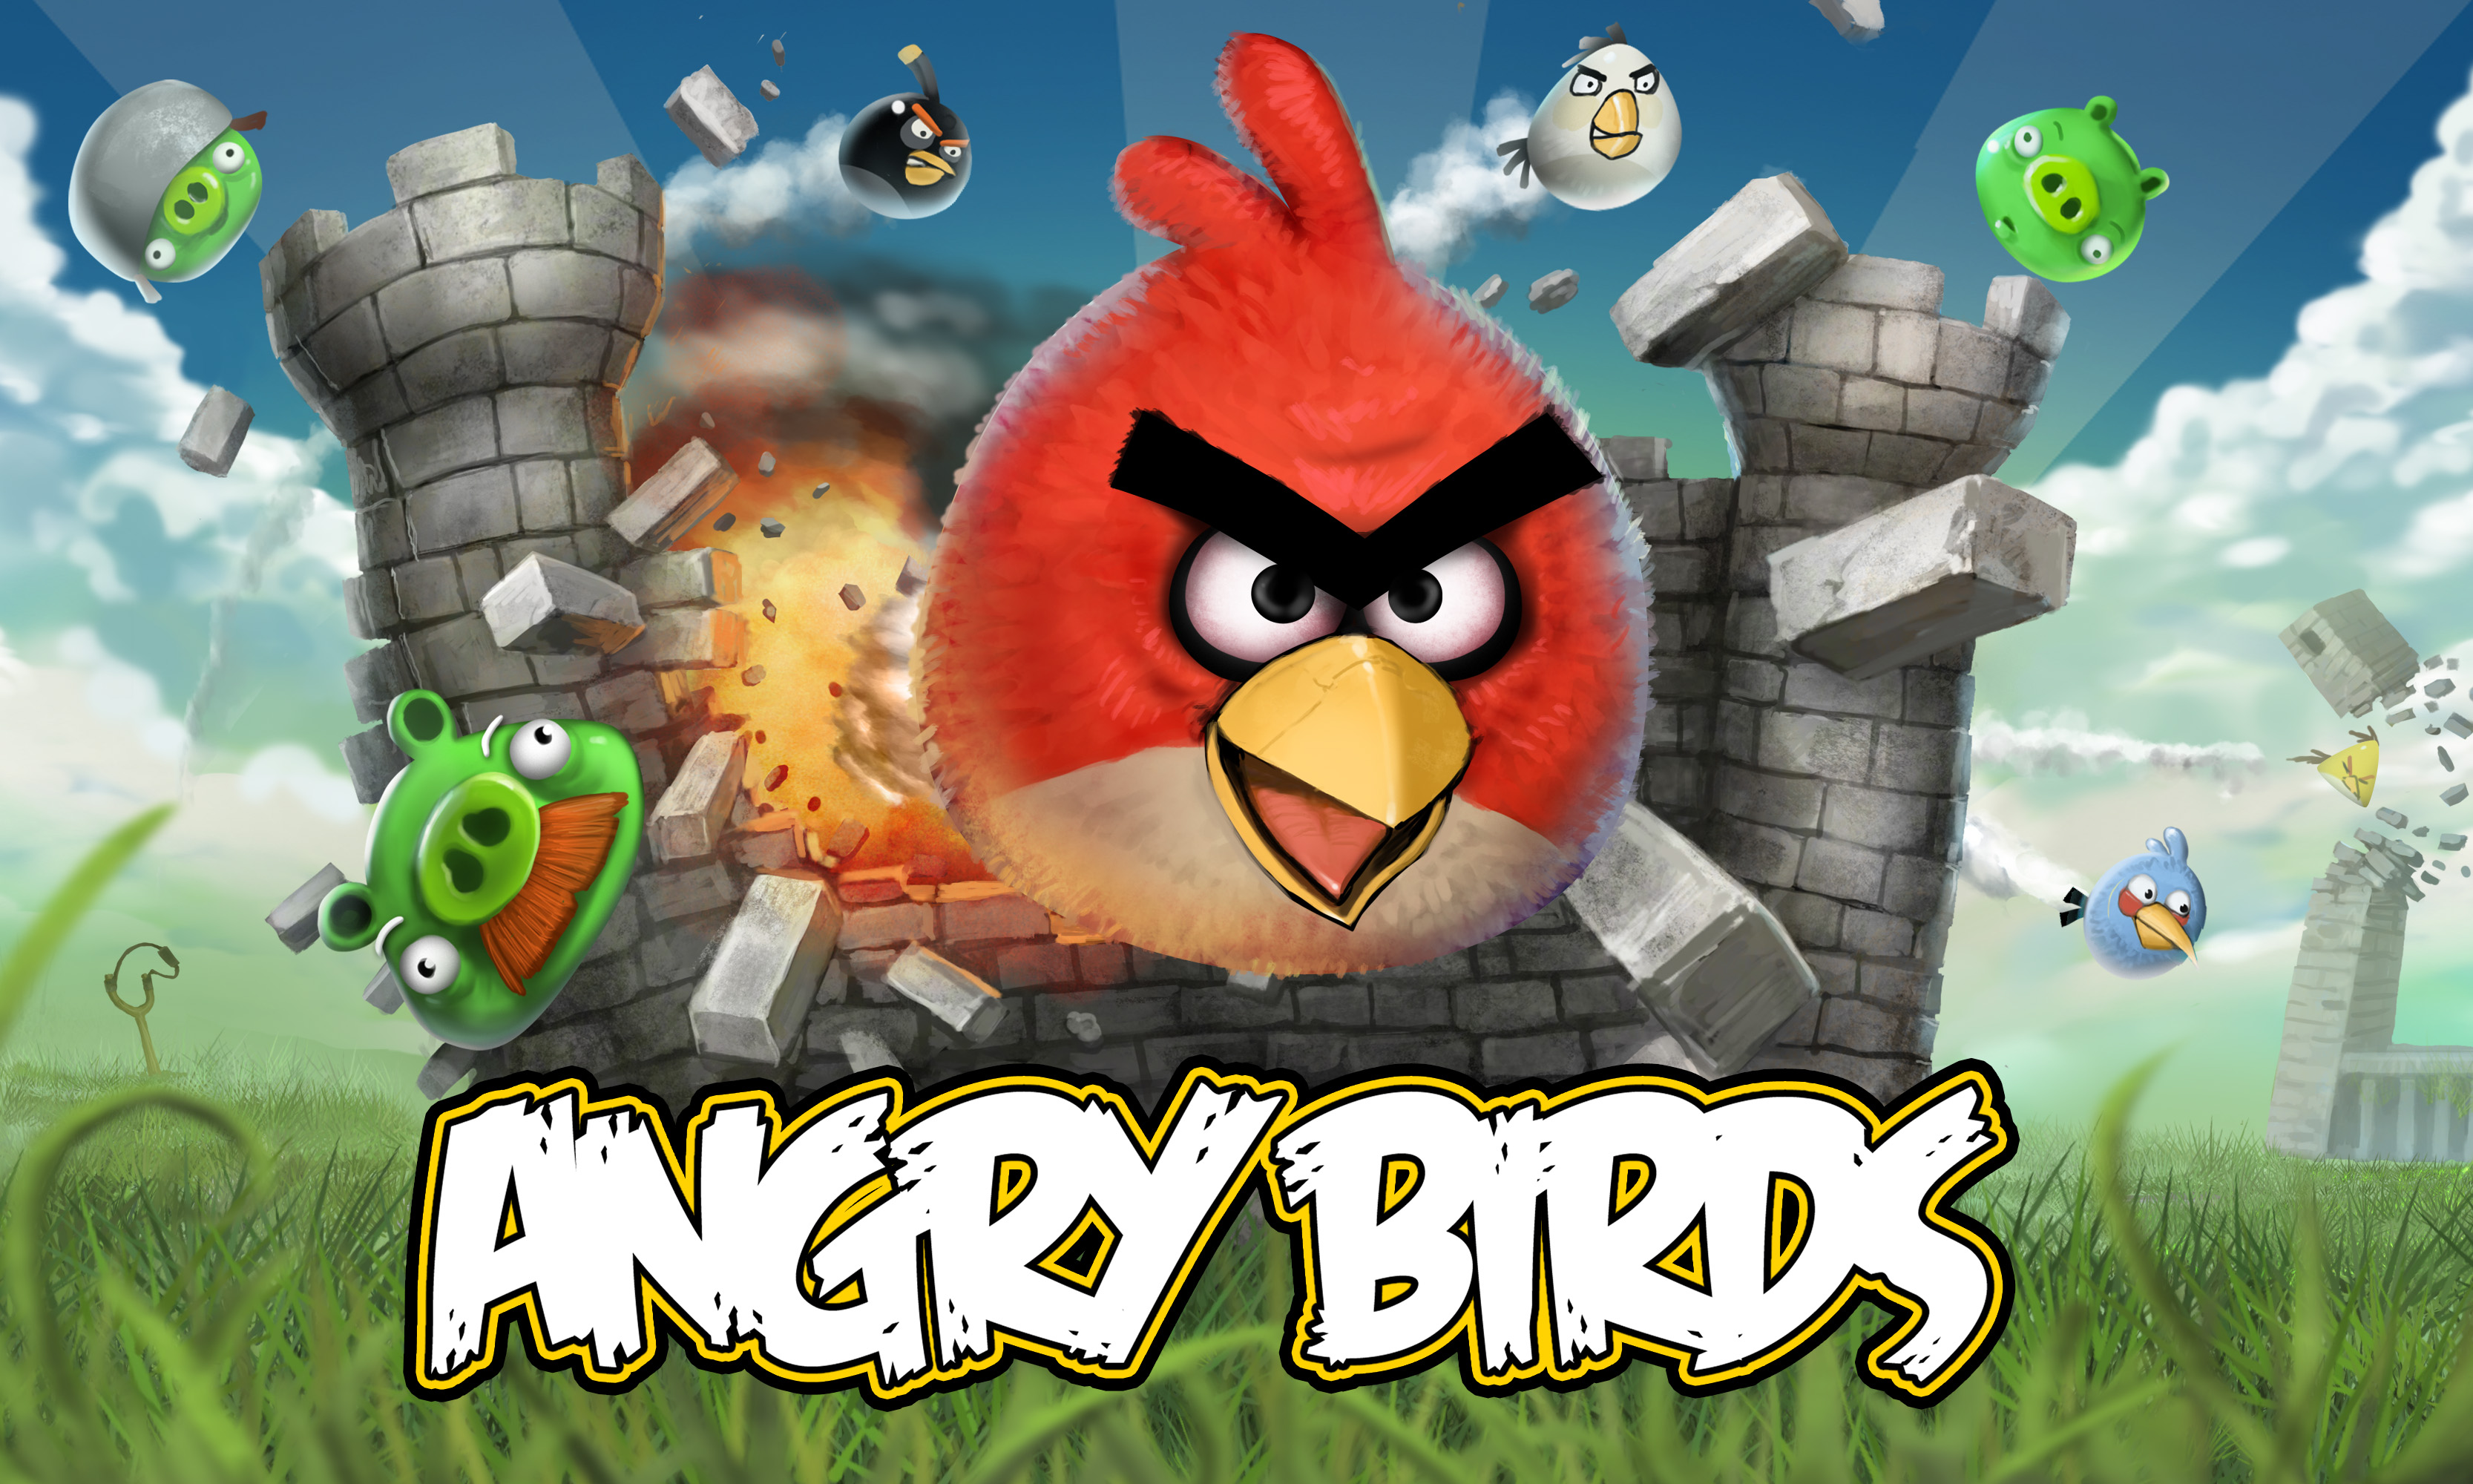 Angry Birds HD Wallpaper   Hintergrund